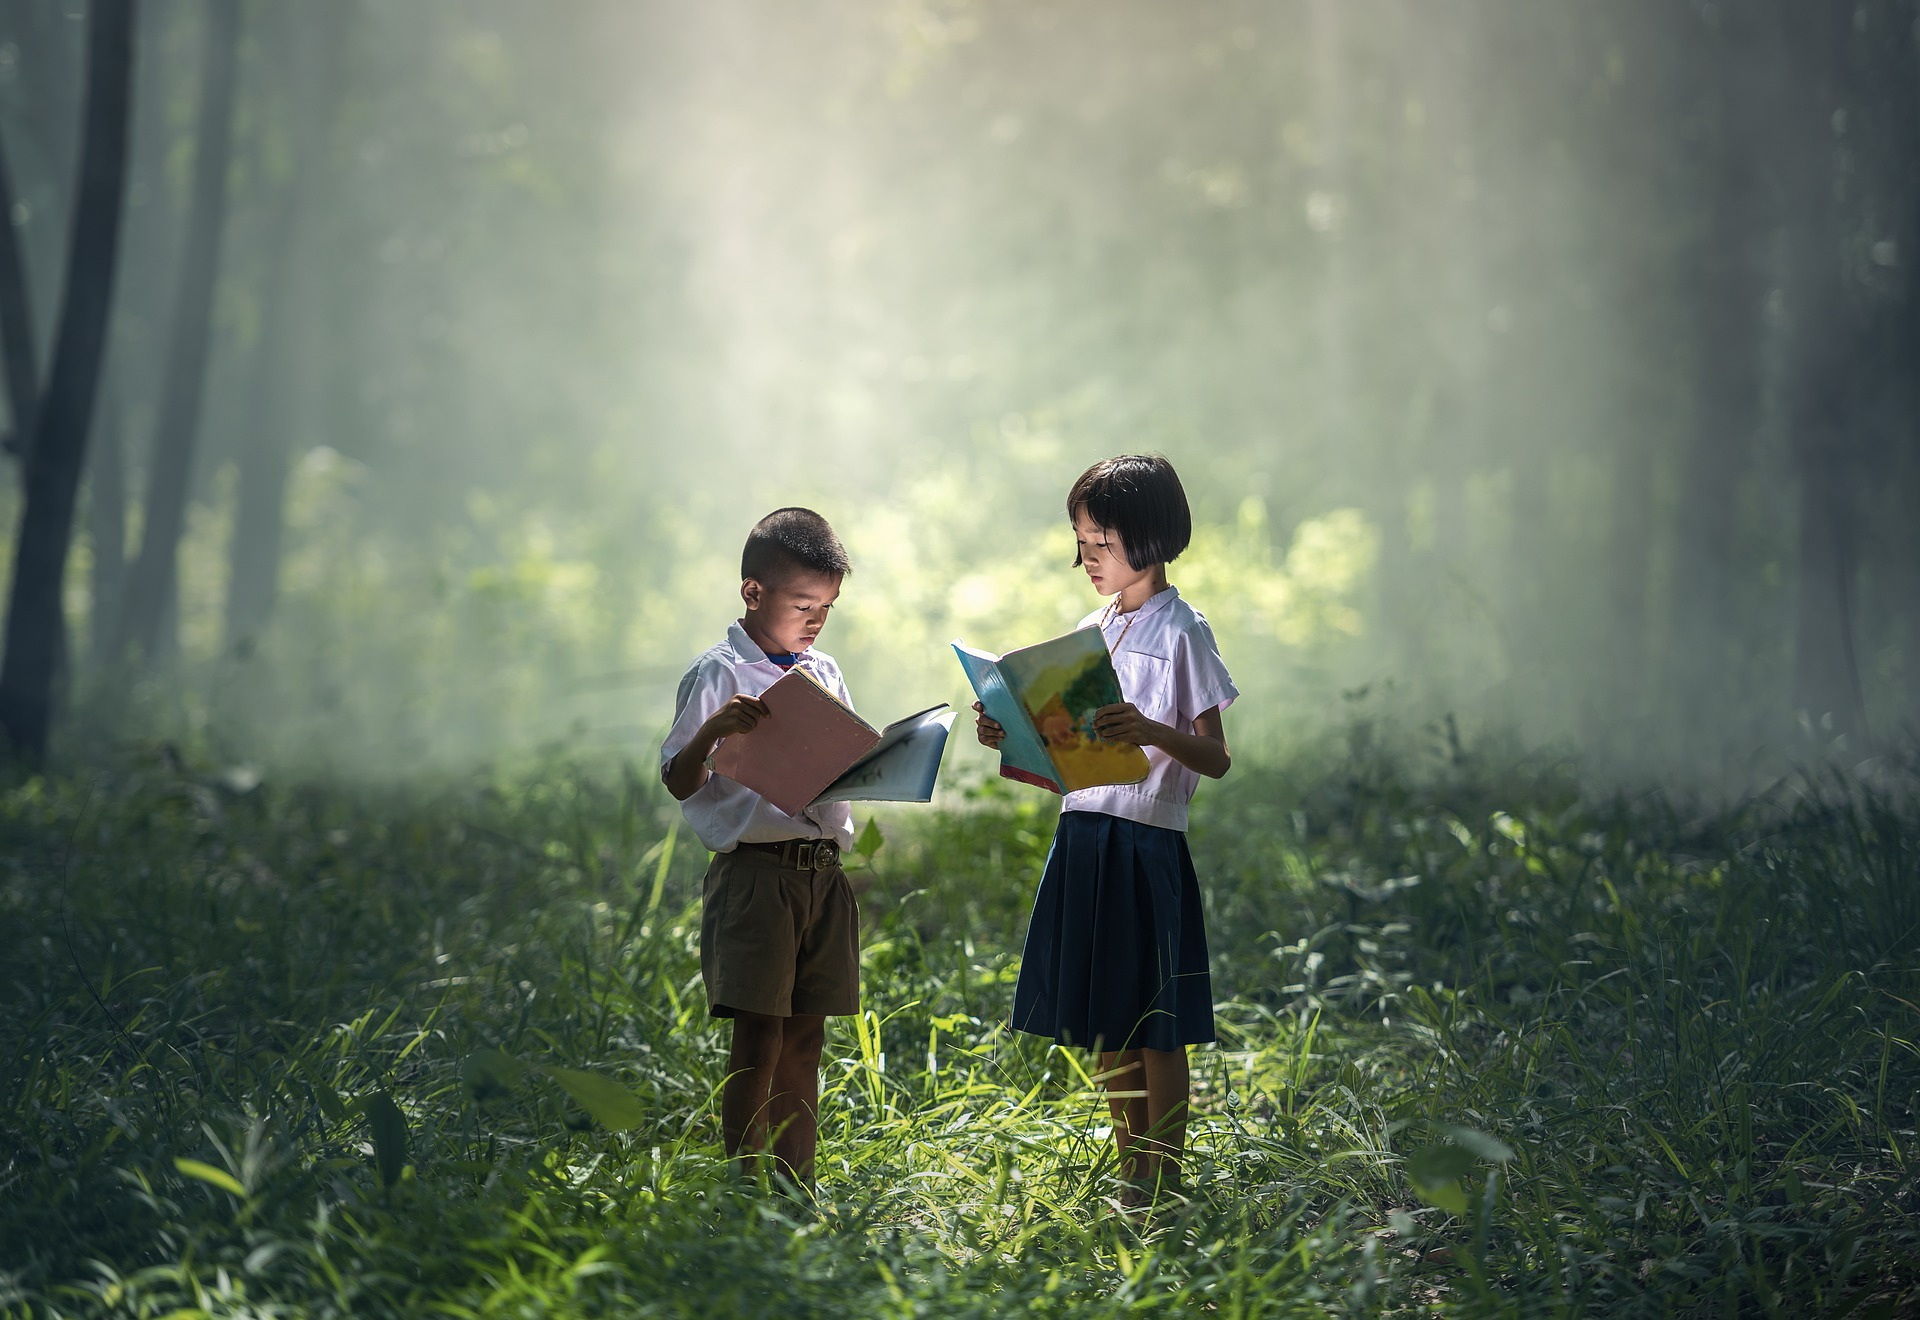 Učenje z naravo